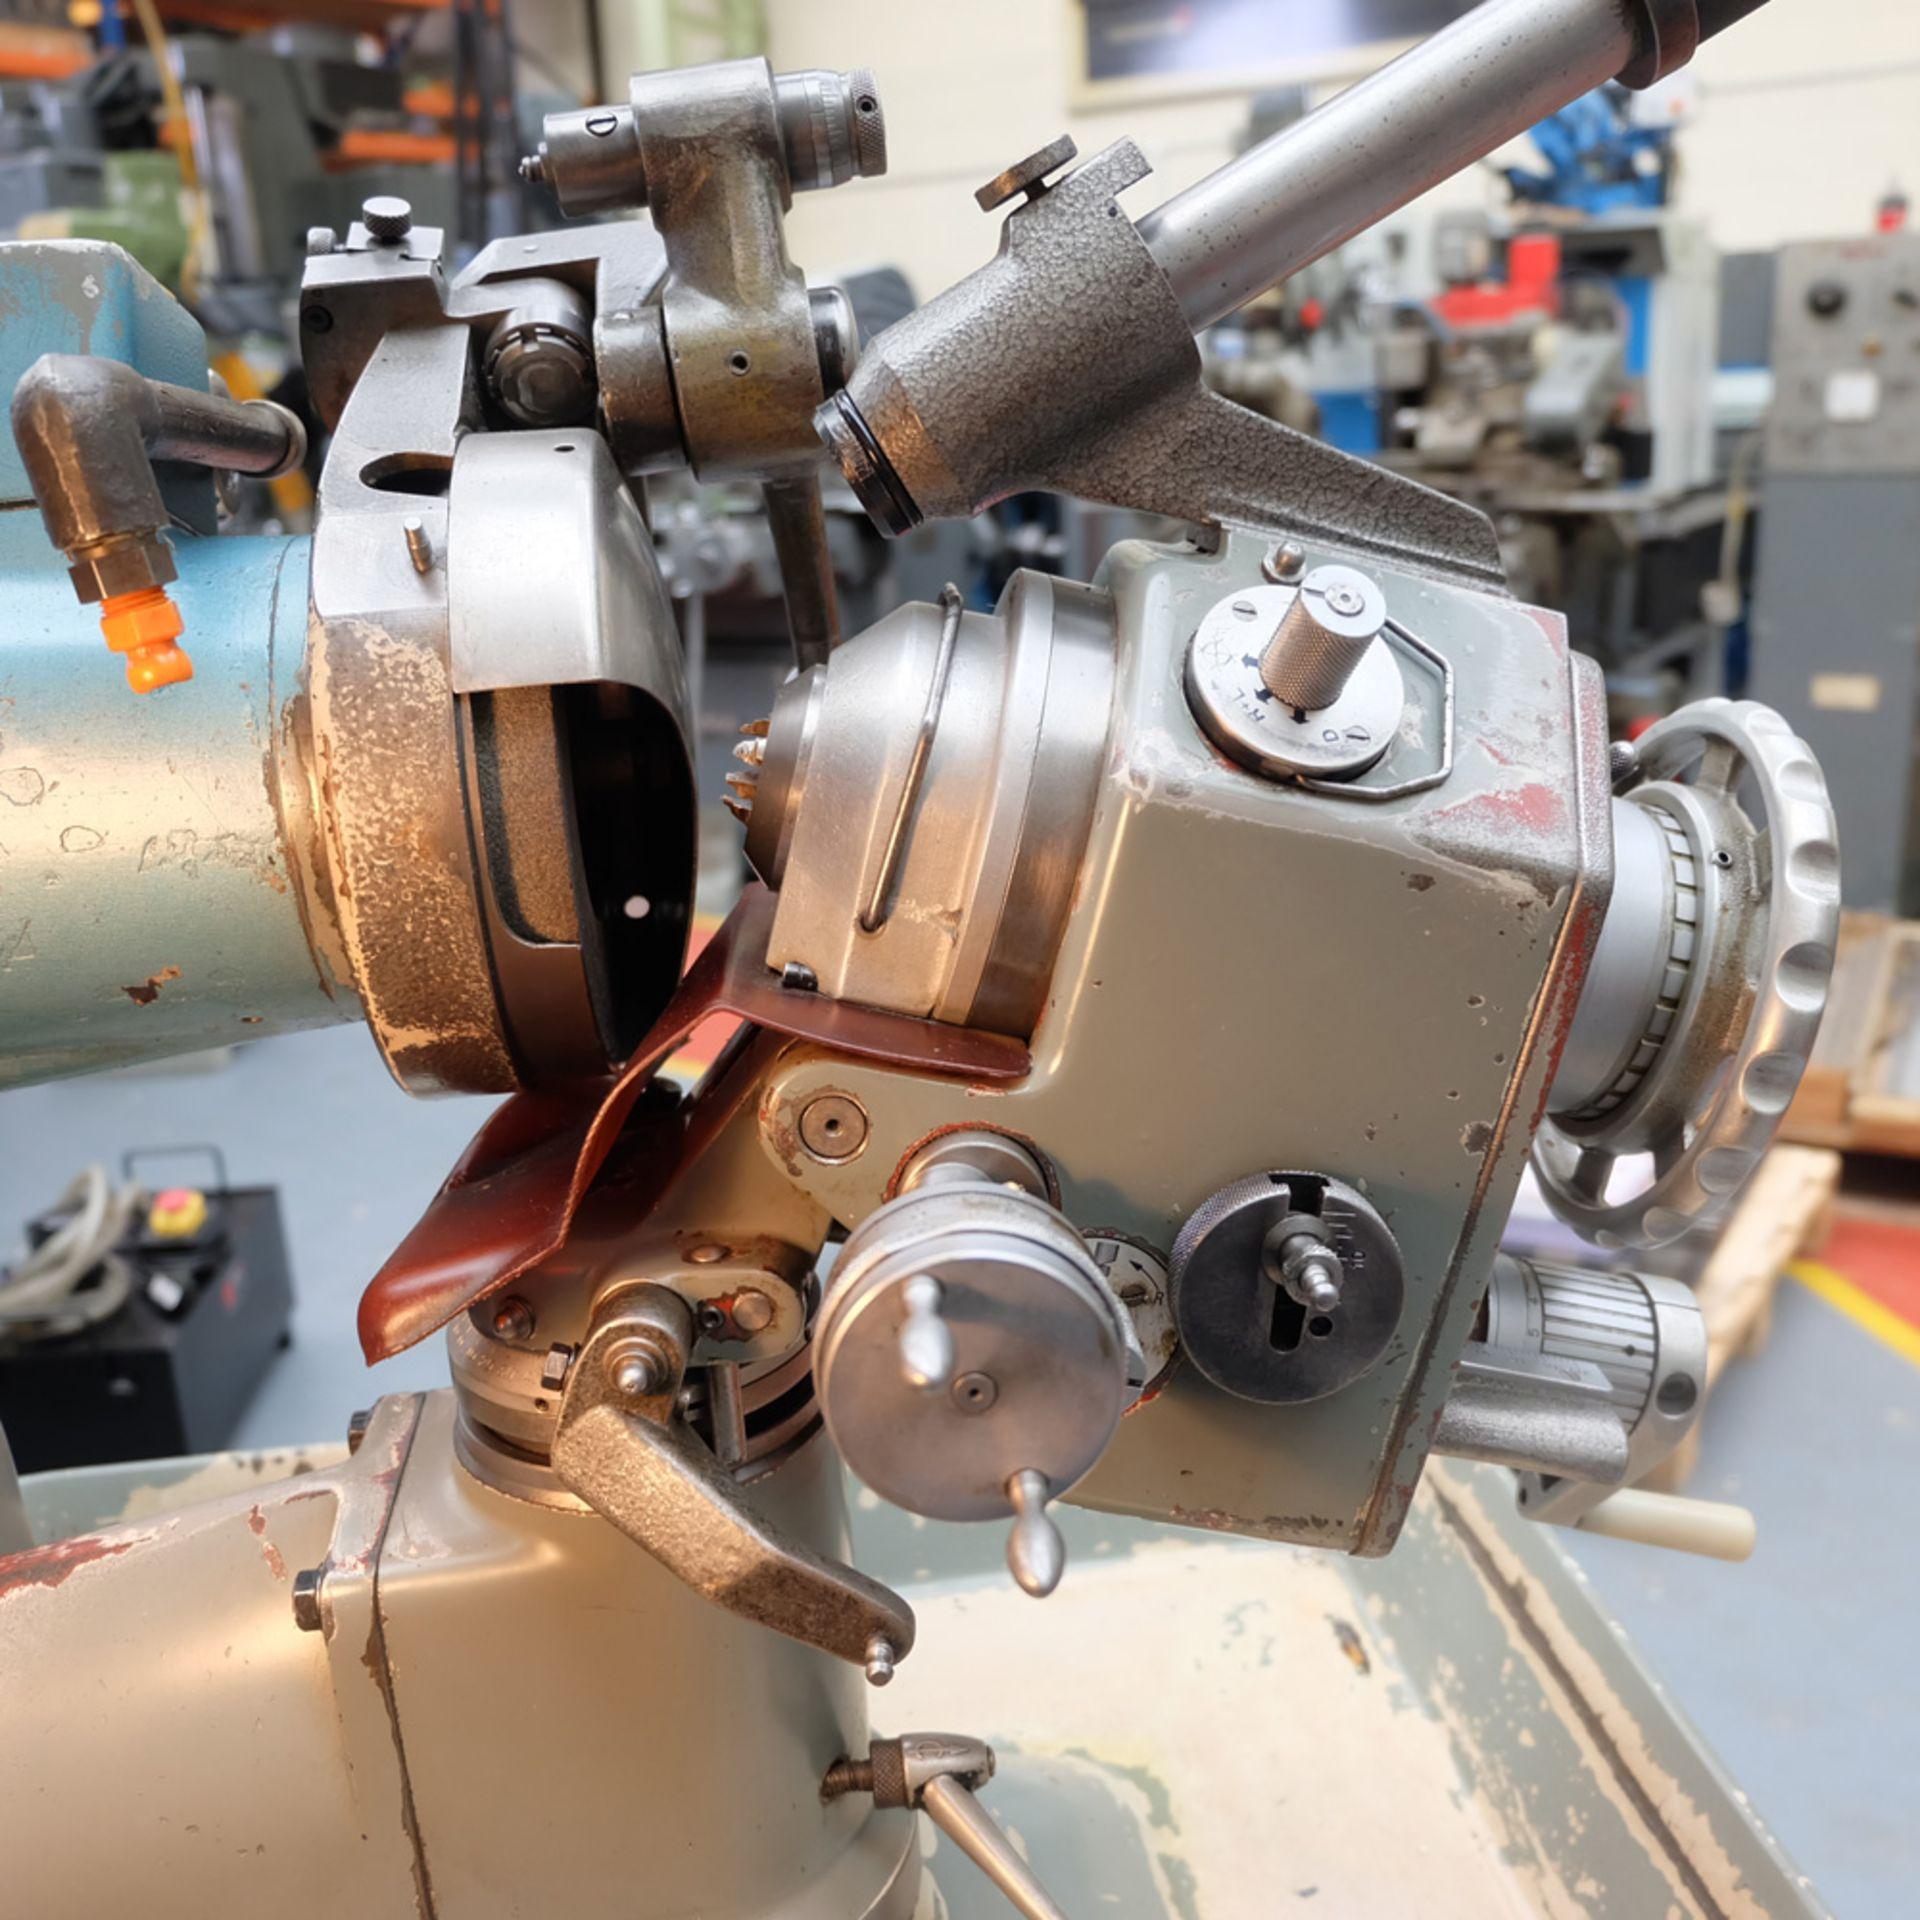 Christen Type 2-32 Twist Drill Grinding Machine. - Image 6 of 14